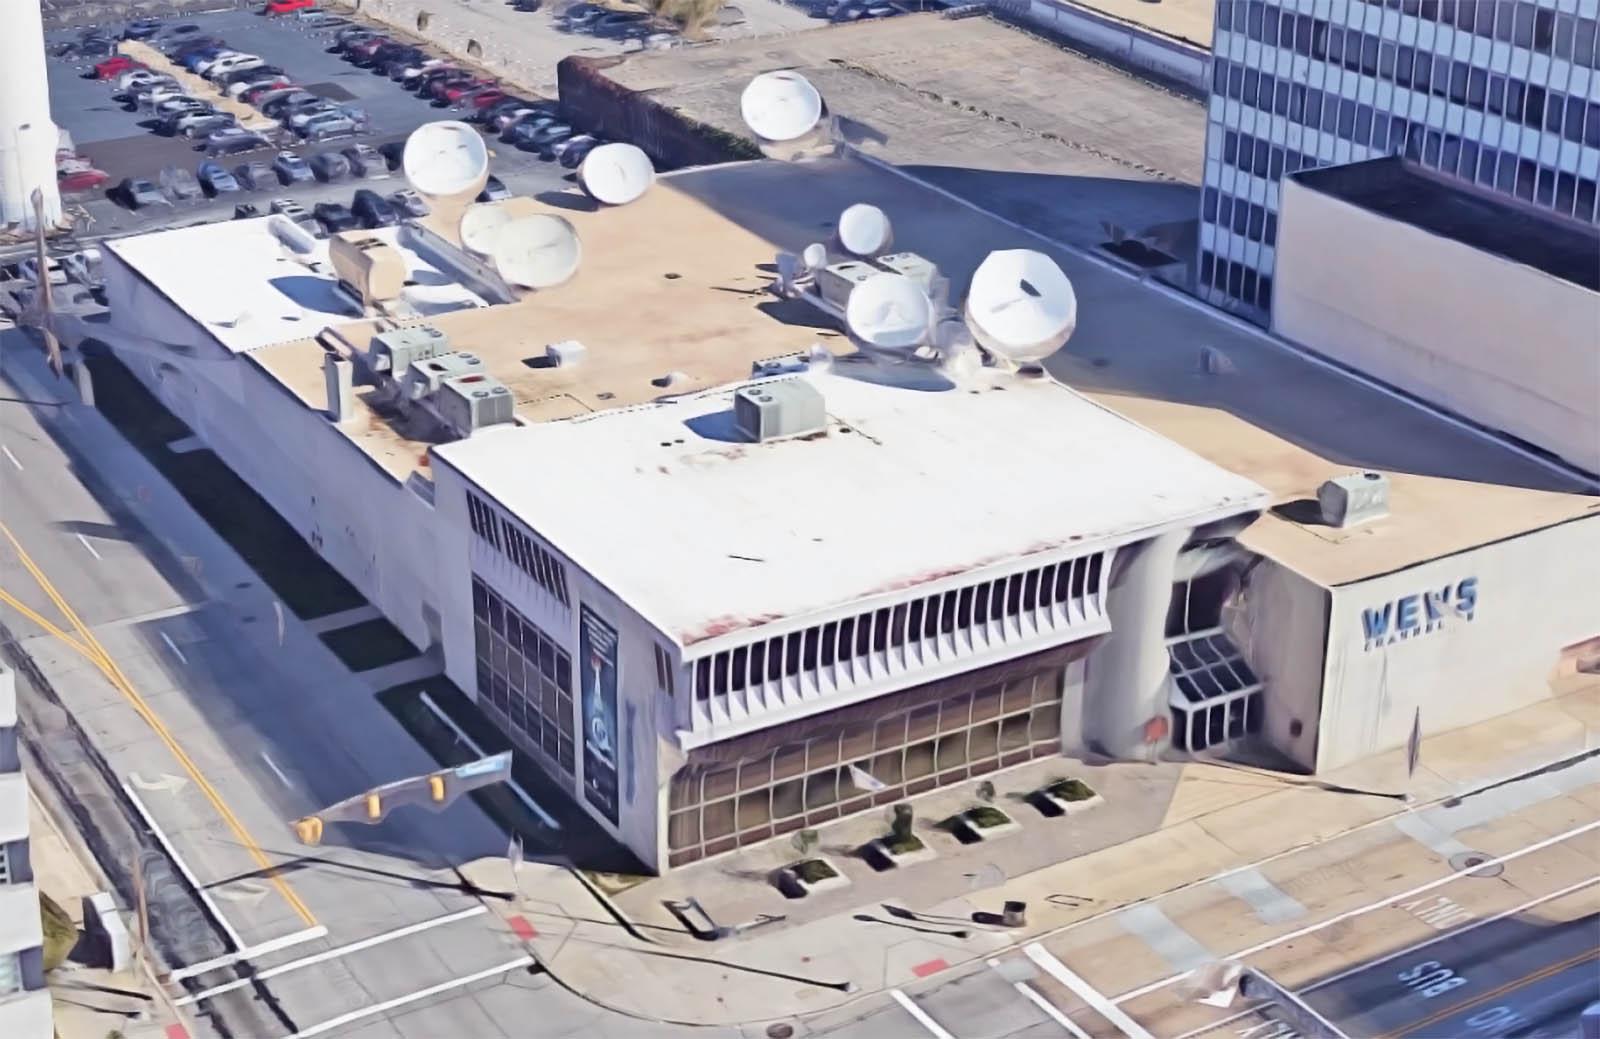 WEWS News studio building